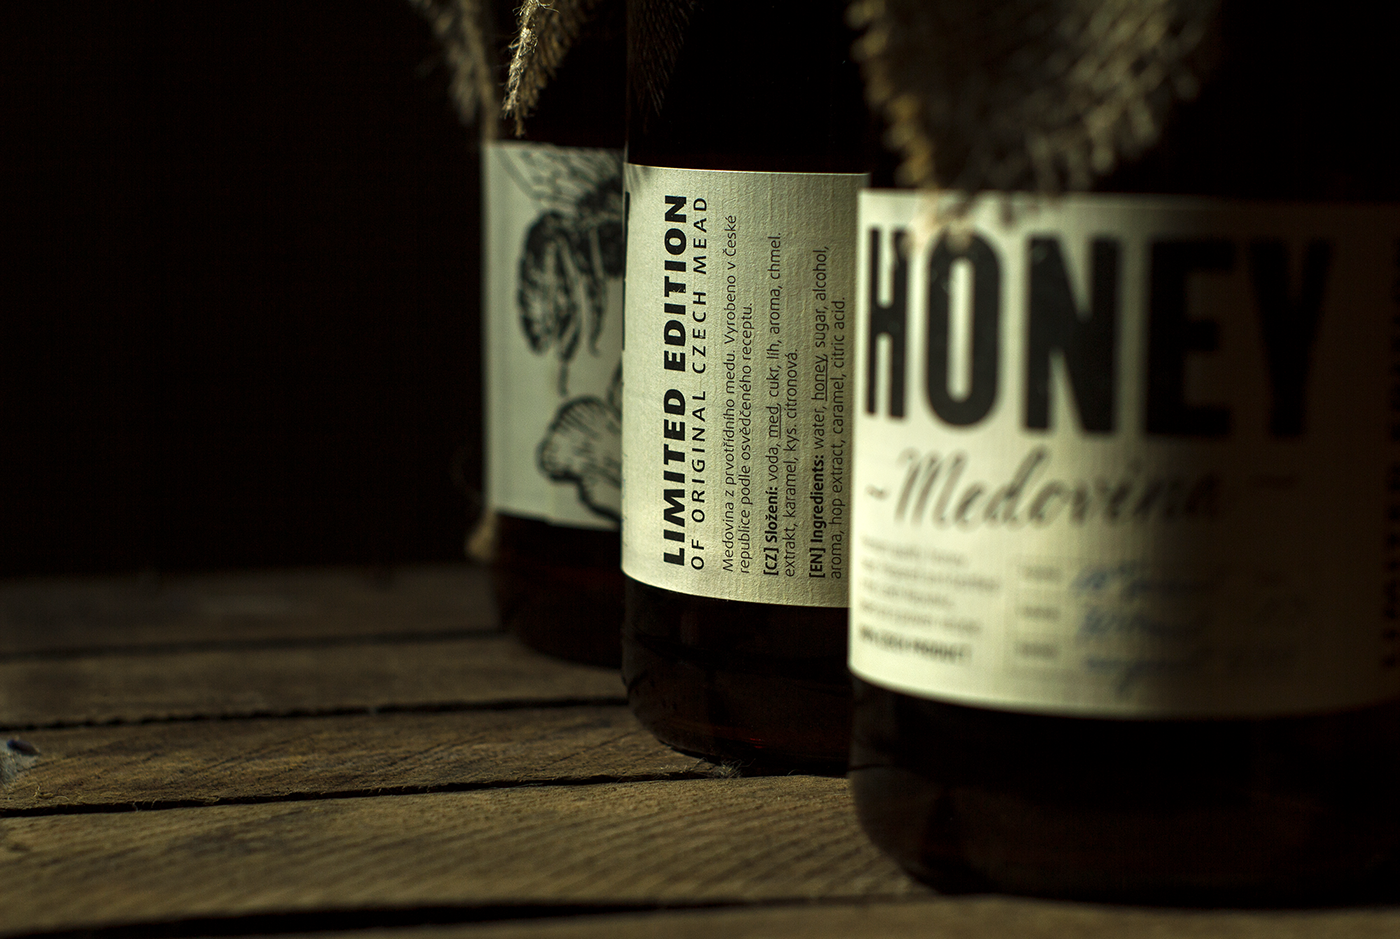 graphic design  design Label alcohol package amoth amothdesign honey mead amothstudio